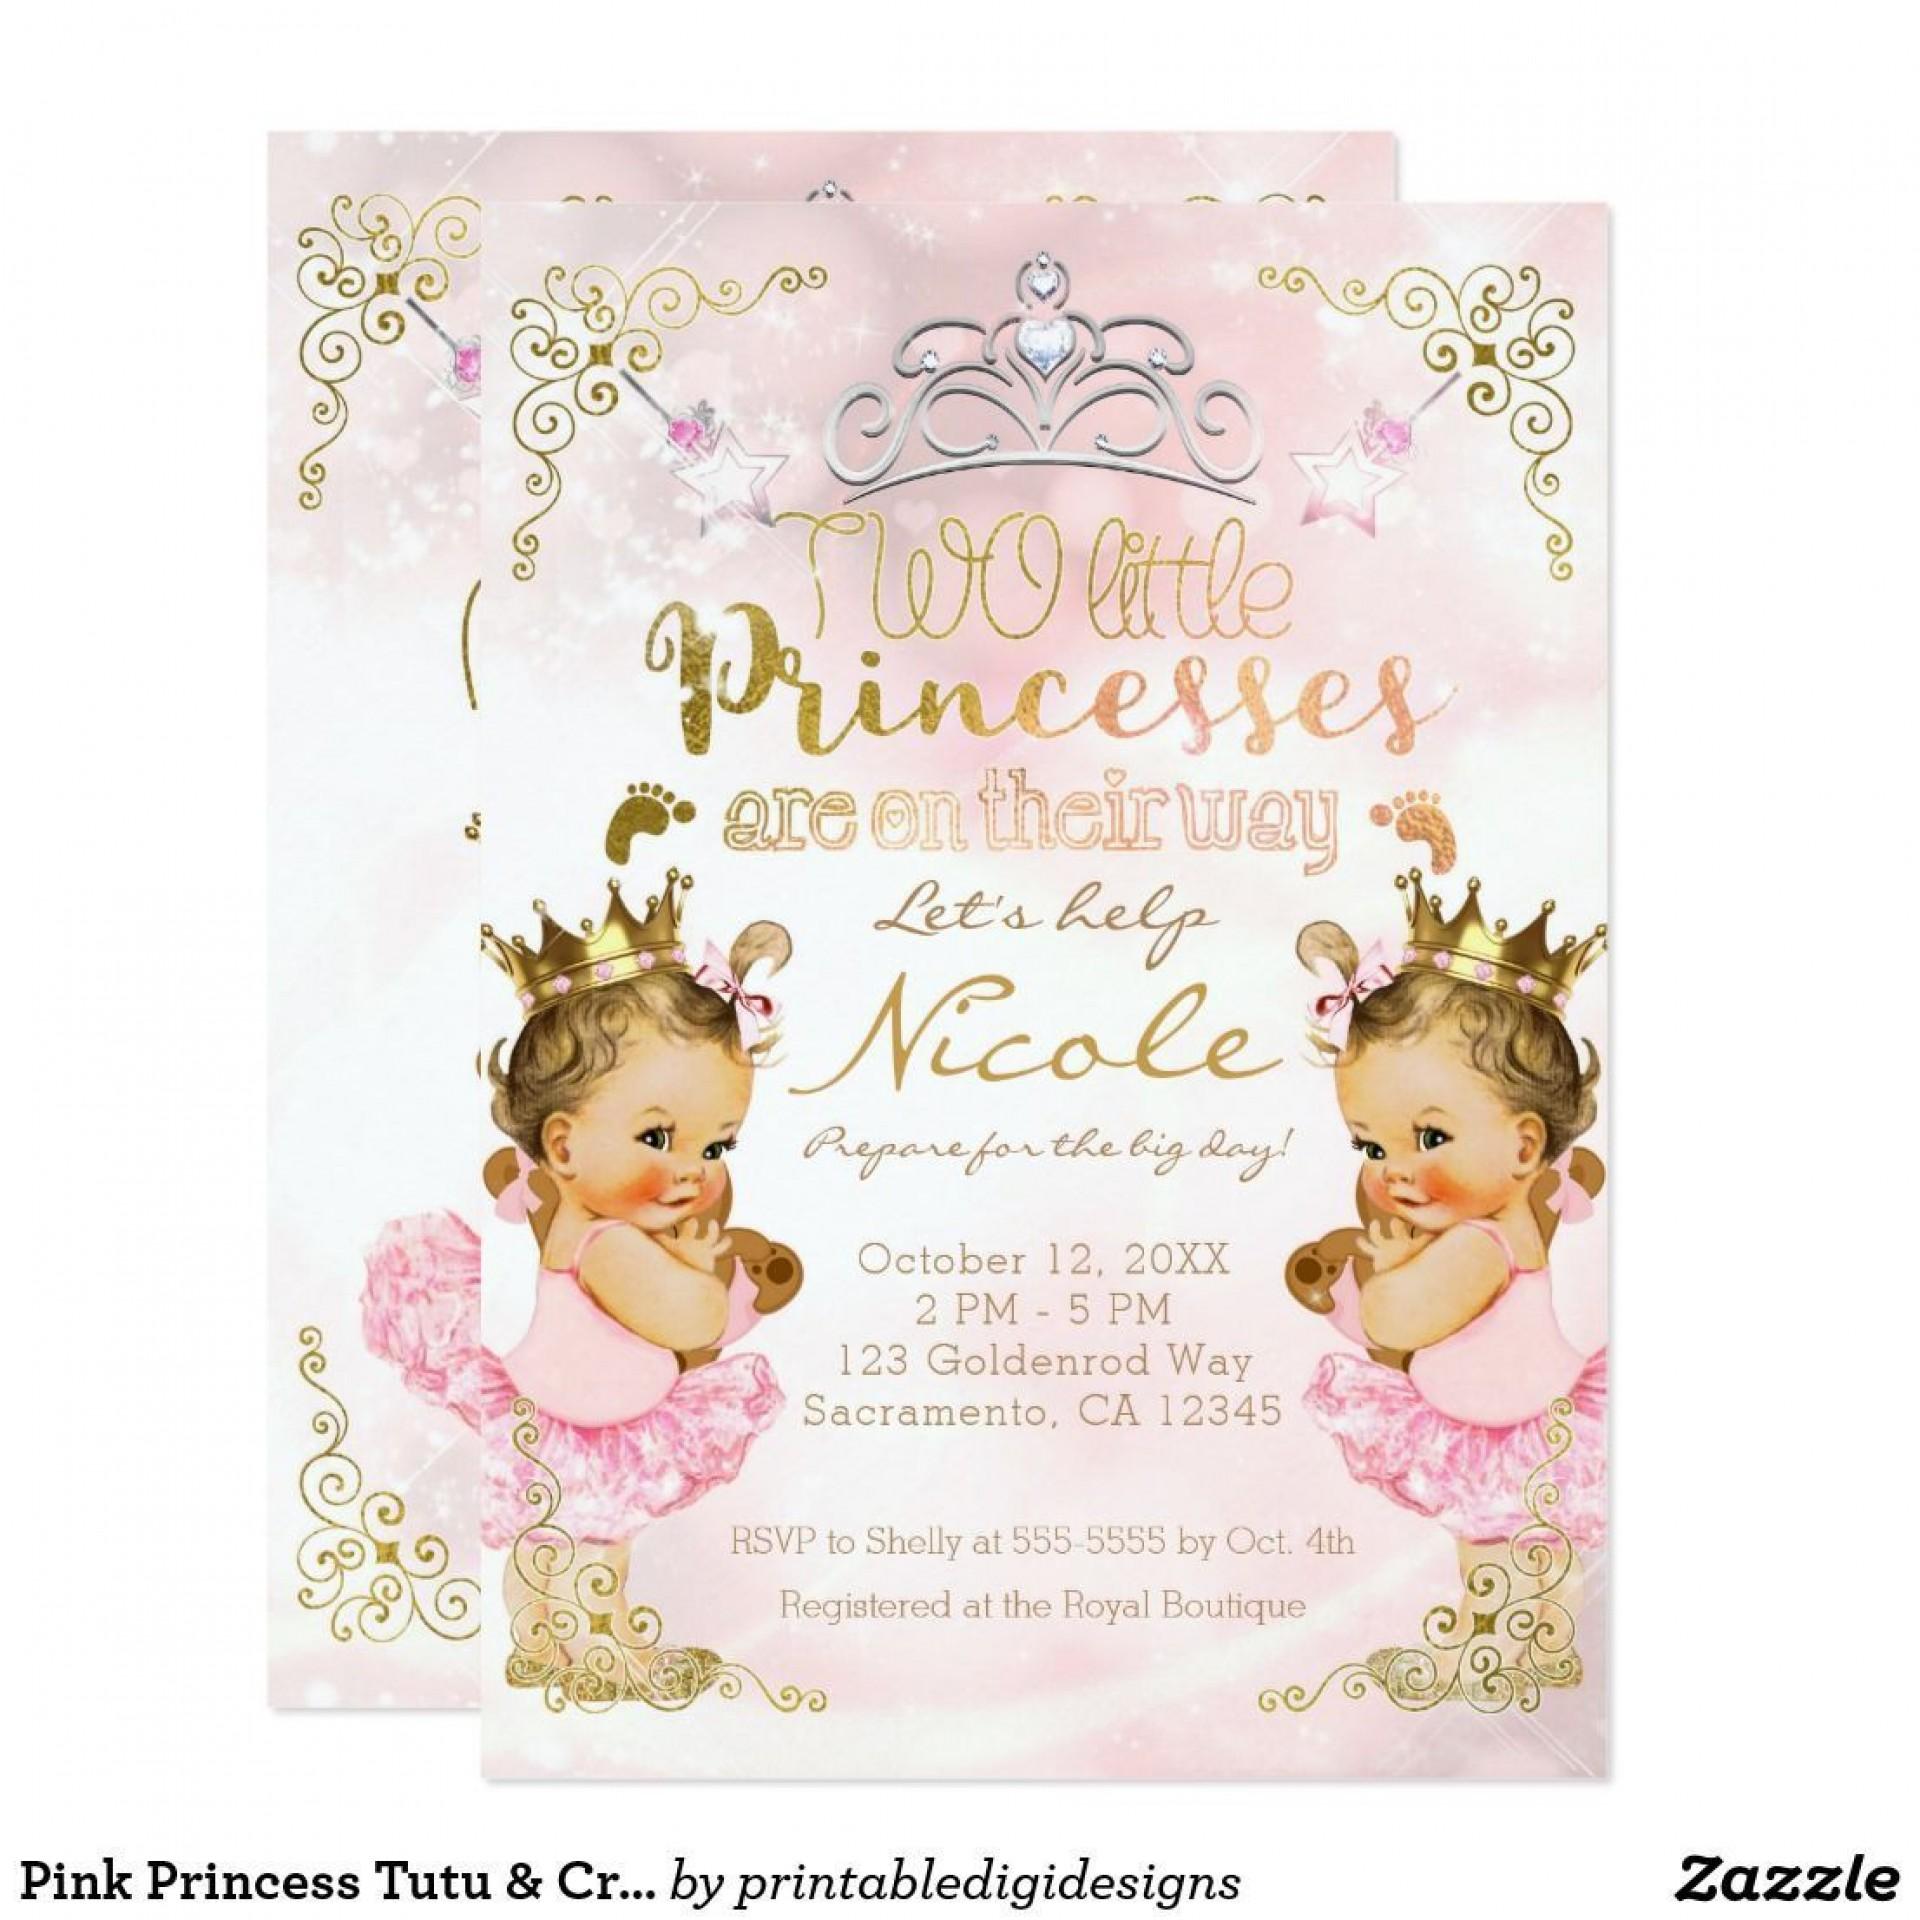 008 Breathtaking Baby Shower Invitation Girl Princes Example  Princess Theme1920